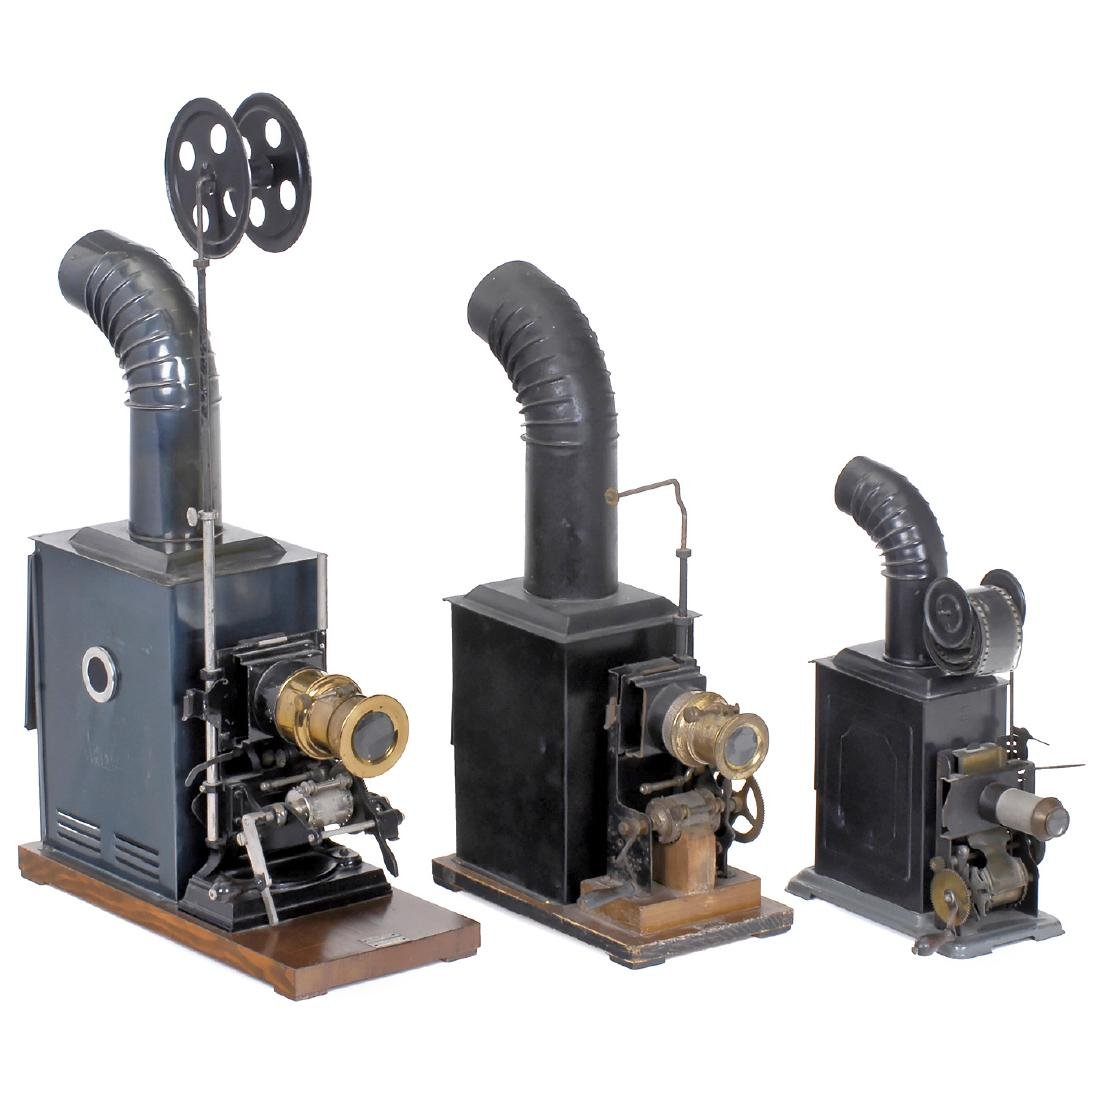 35mm Cinematograph by Gebrüder Bing, c. 1910